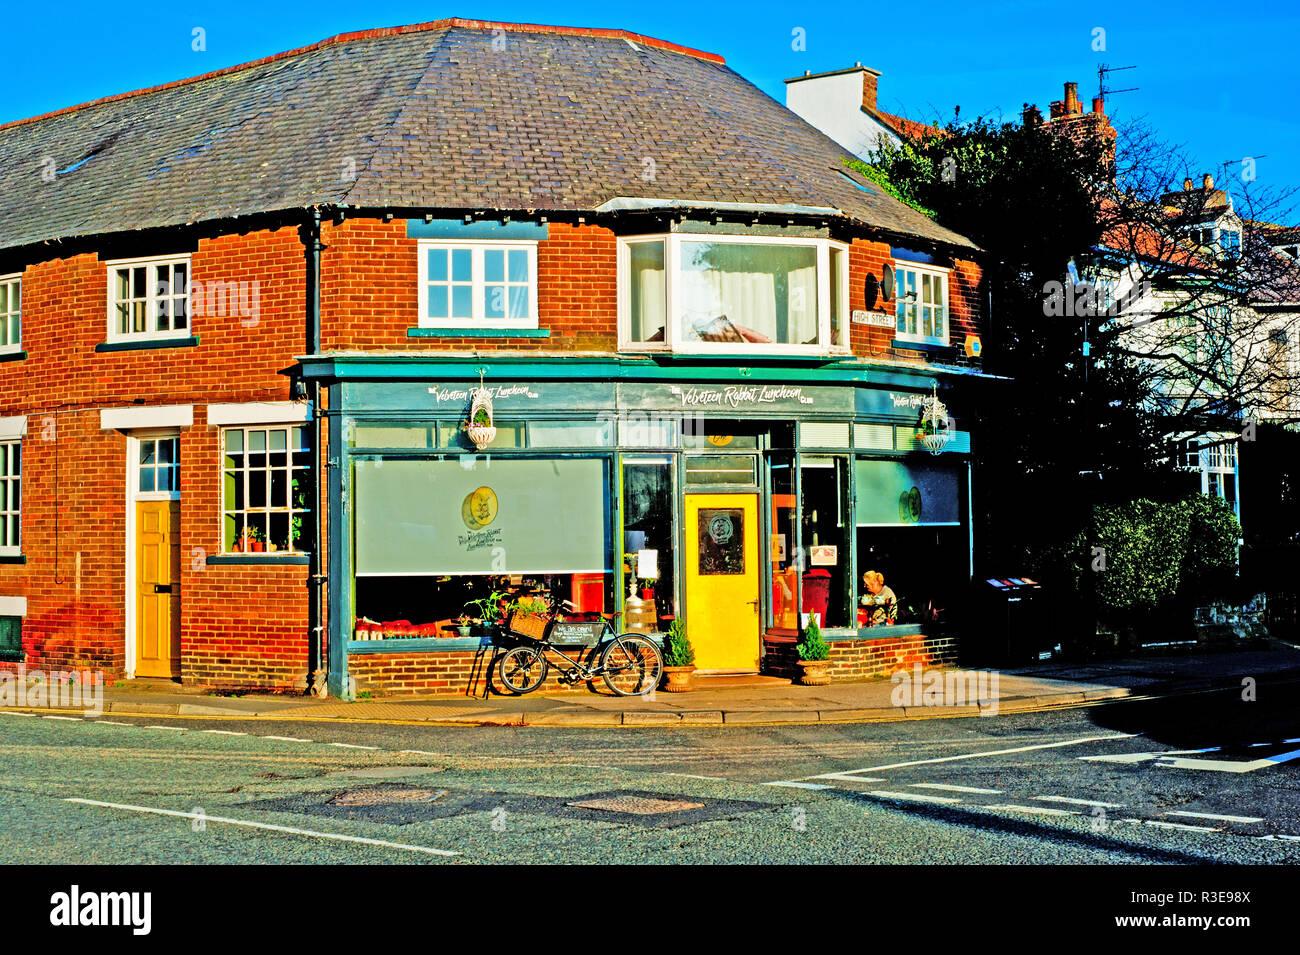 The Velveteen Rabbit Luncheon, Great Ayton, North Yorkshire, England - Stock Image